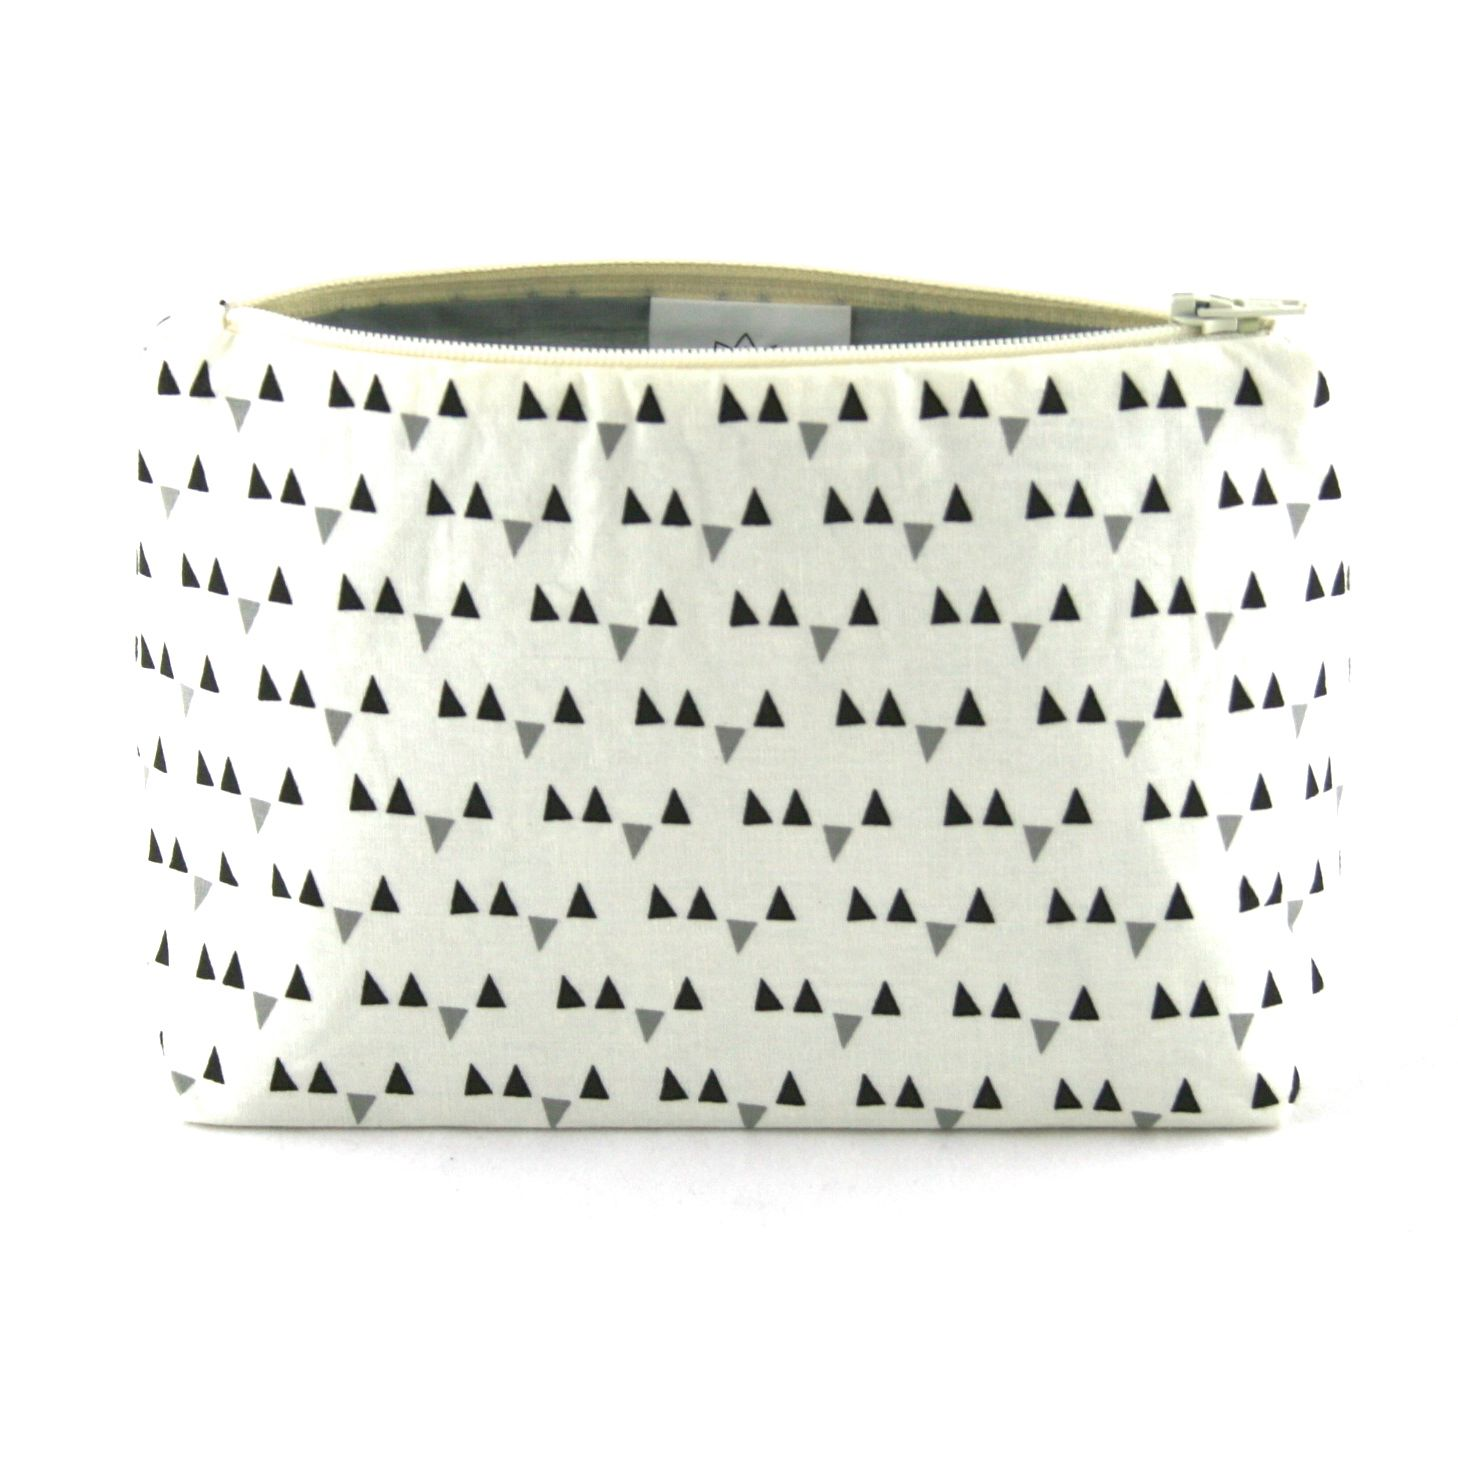 Gray Mini Triangle Makeup Bag - Le Pique Nique by Jordani Sarreal 01.jpg